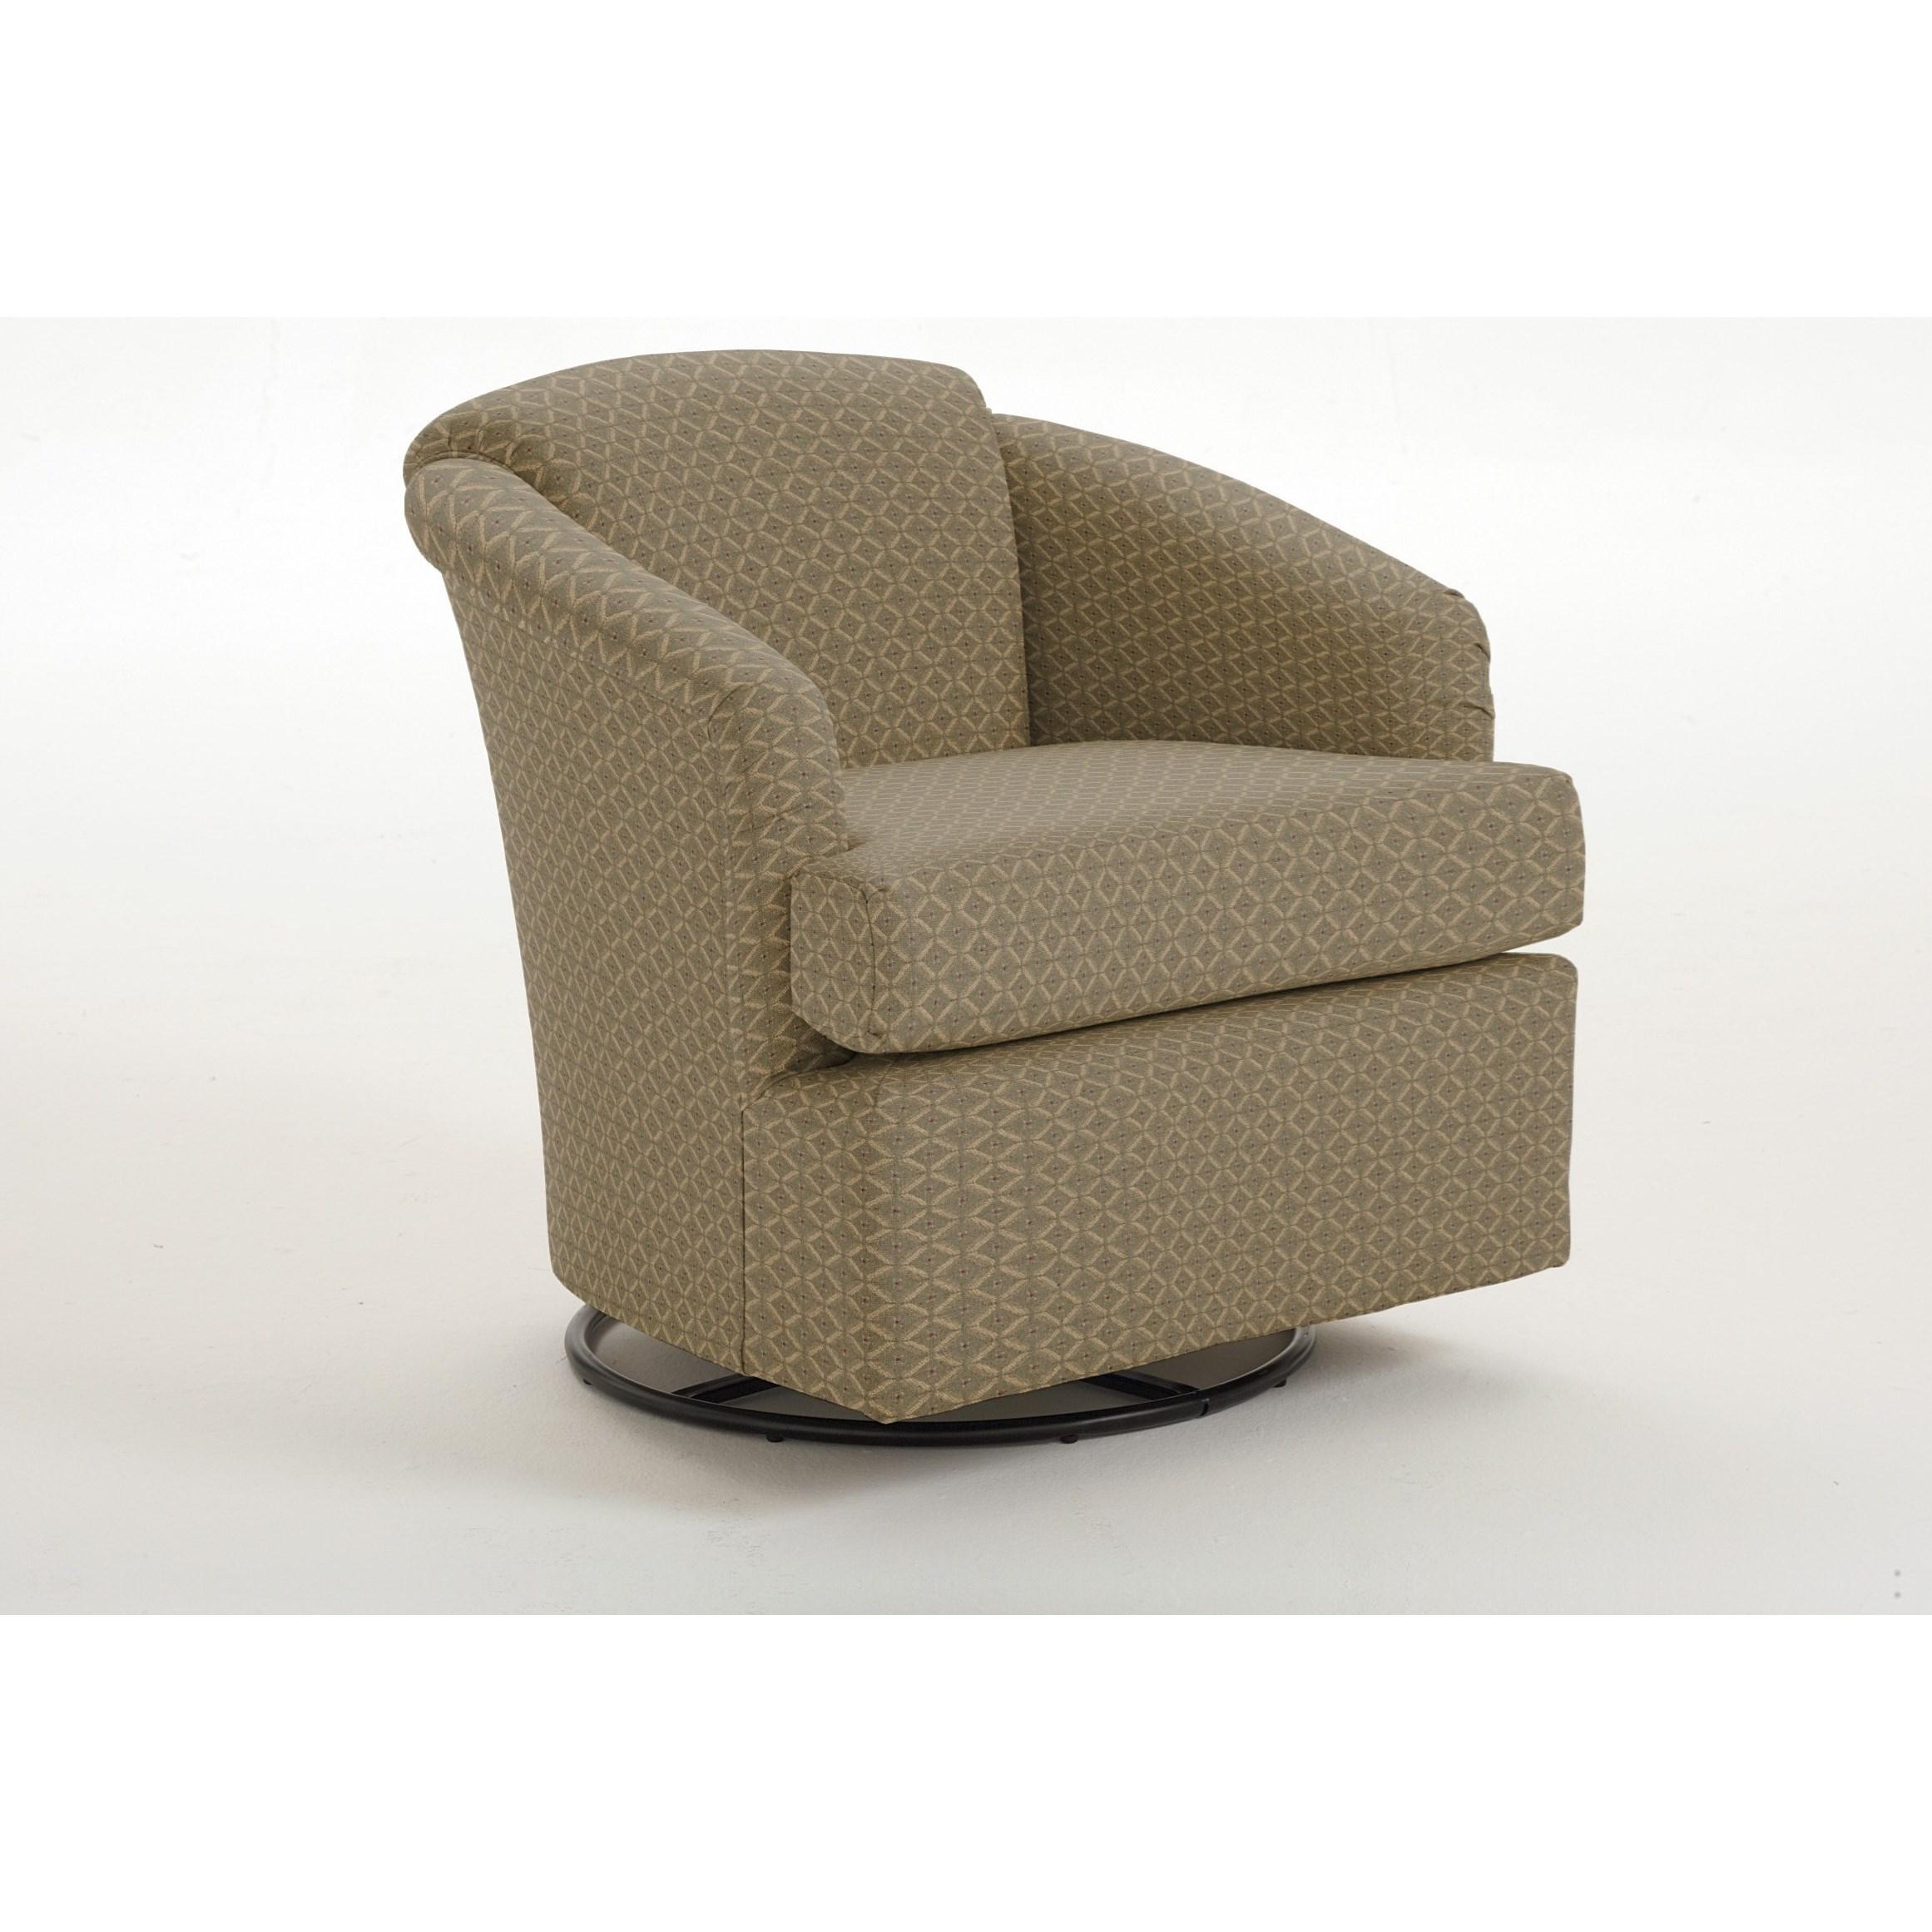 Best Home Furnishings Chairs  Swivel Barrel Cass Swivel